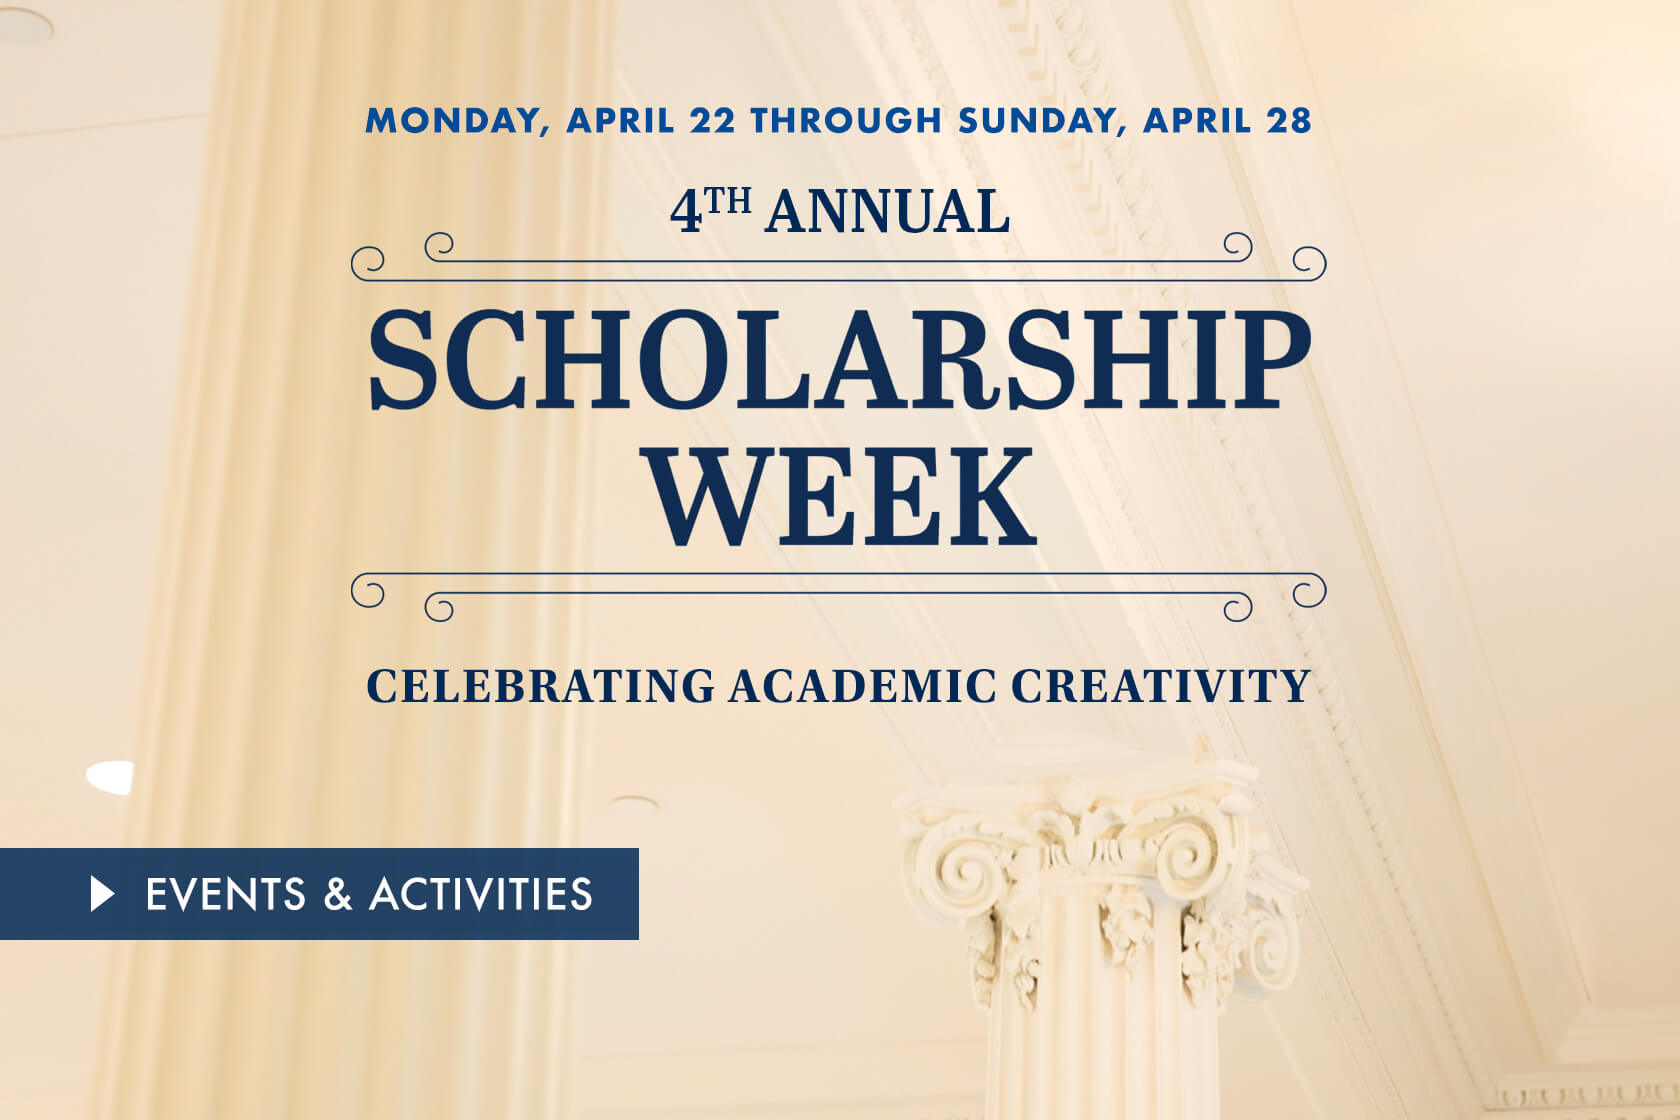 Scholarship Week, Celebrating Academic Creativity